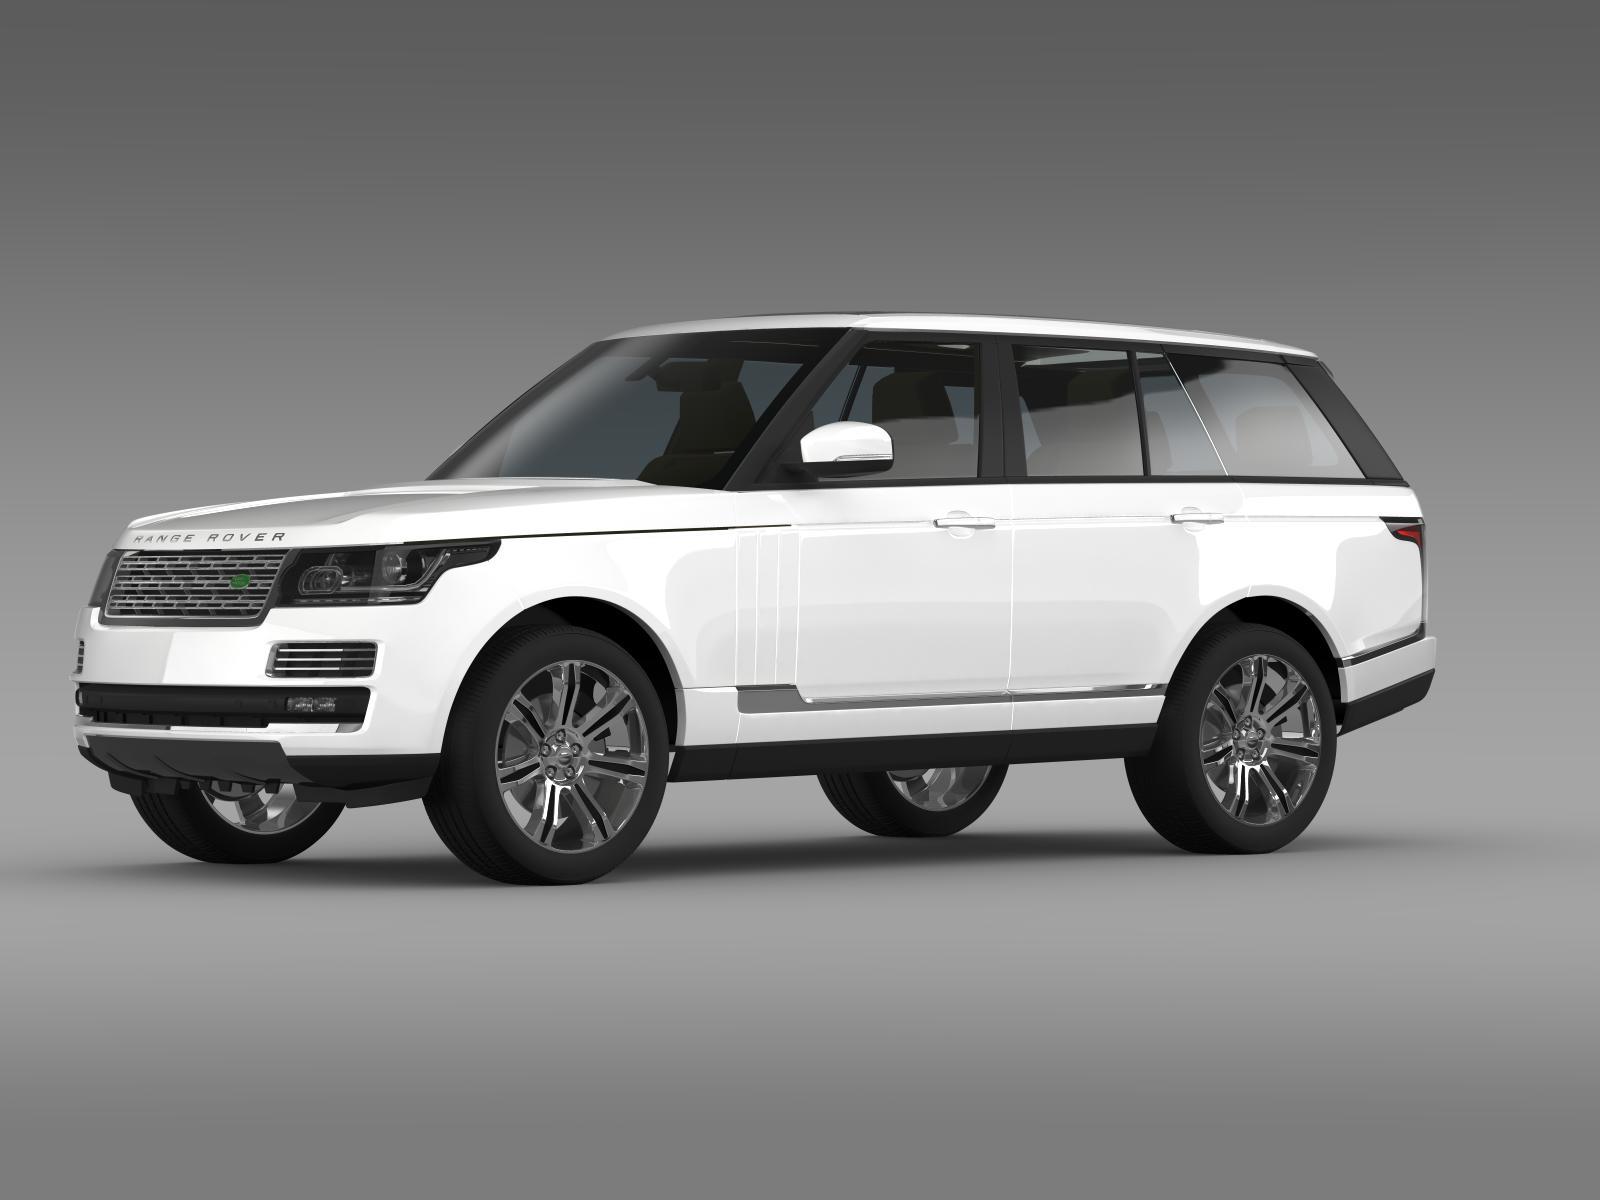 range rover autobiography black l405 2014 3d model 3ds max fbx c4d lwo ma mb hrc xsi obj 162012